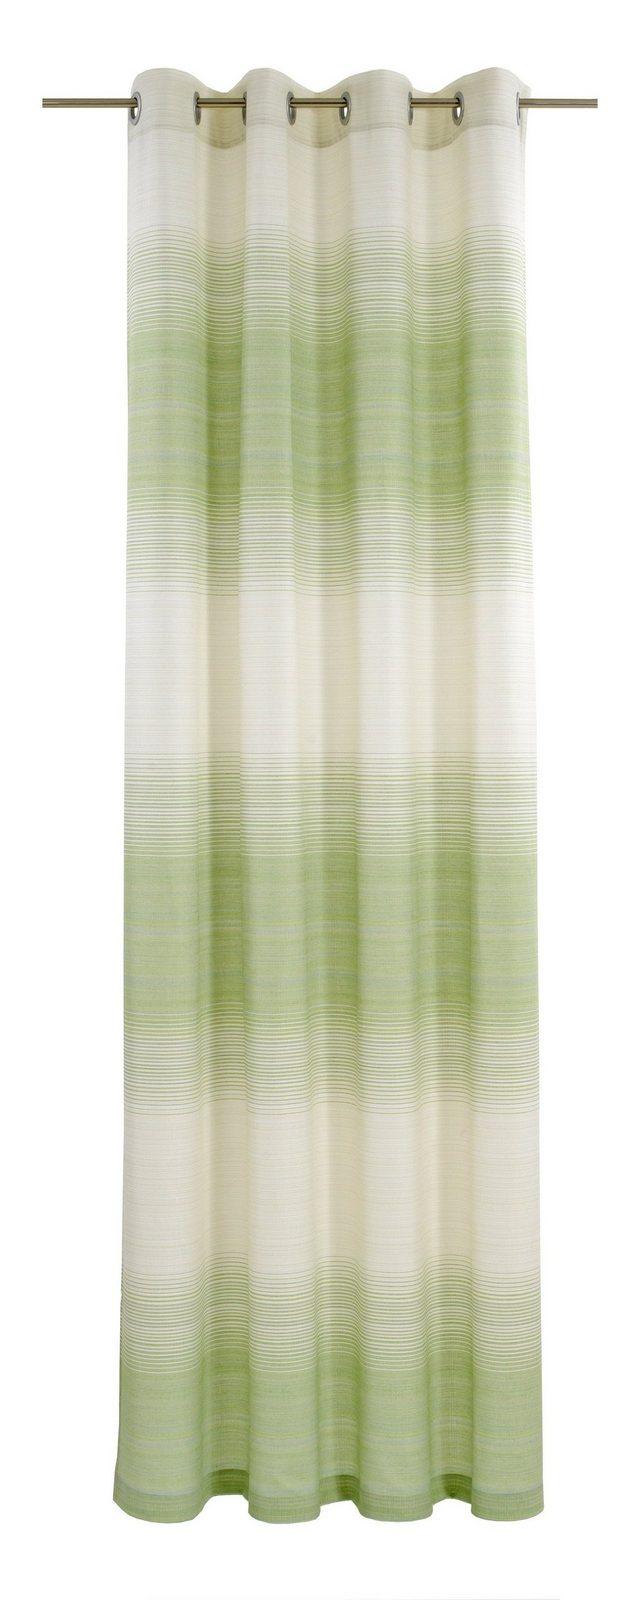 Vorhang »Flow«, DEKO TRENDS, Ösen (1 Stück) jetztbilligerkaufen